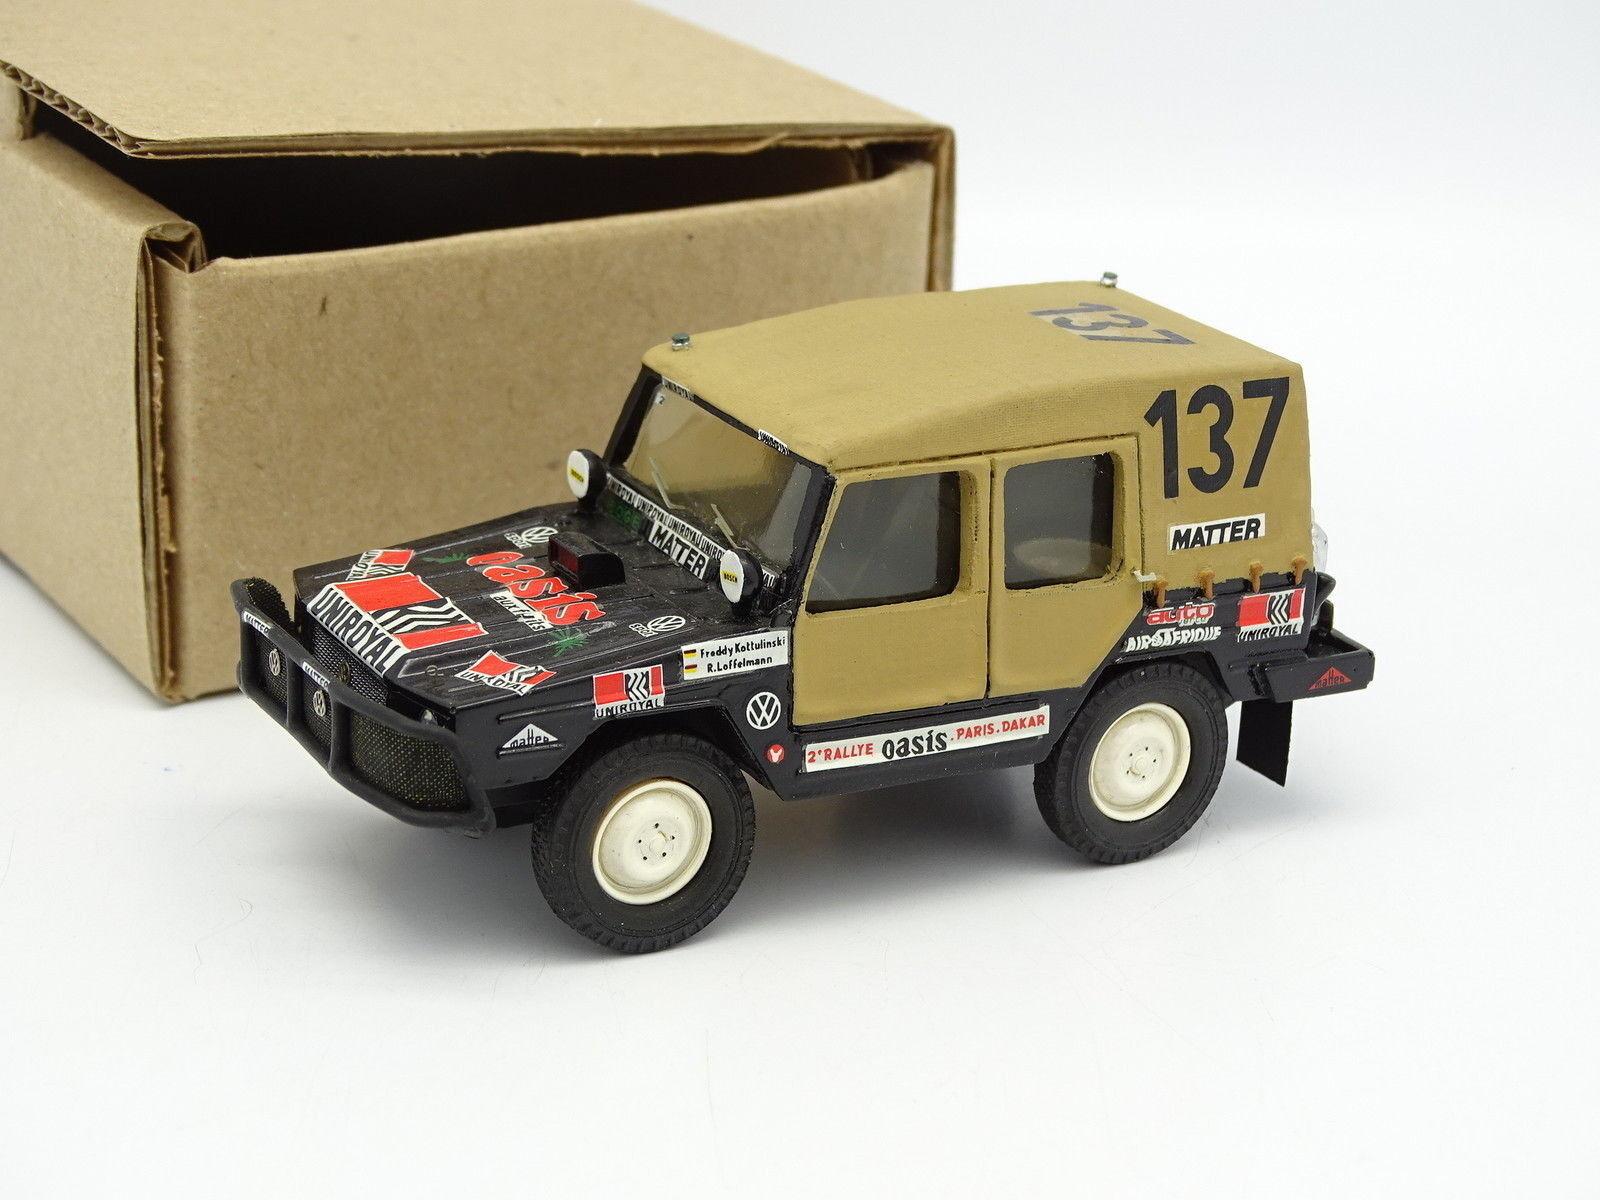 Graphyland Kit Montato 1/43 - VW Iltis Parigi Dakar 1980